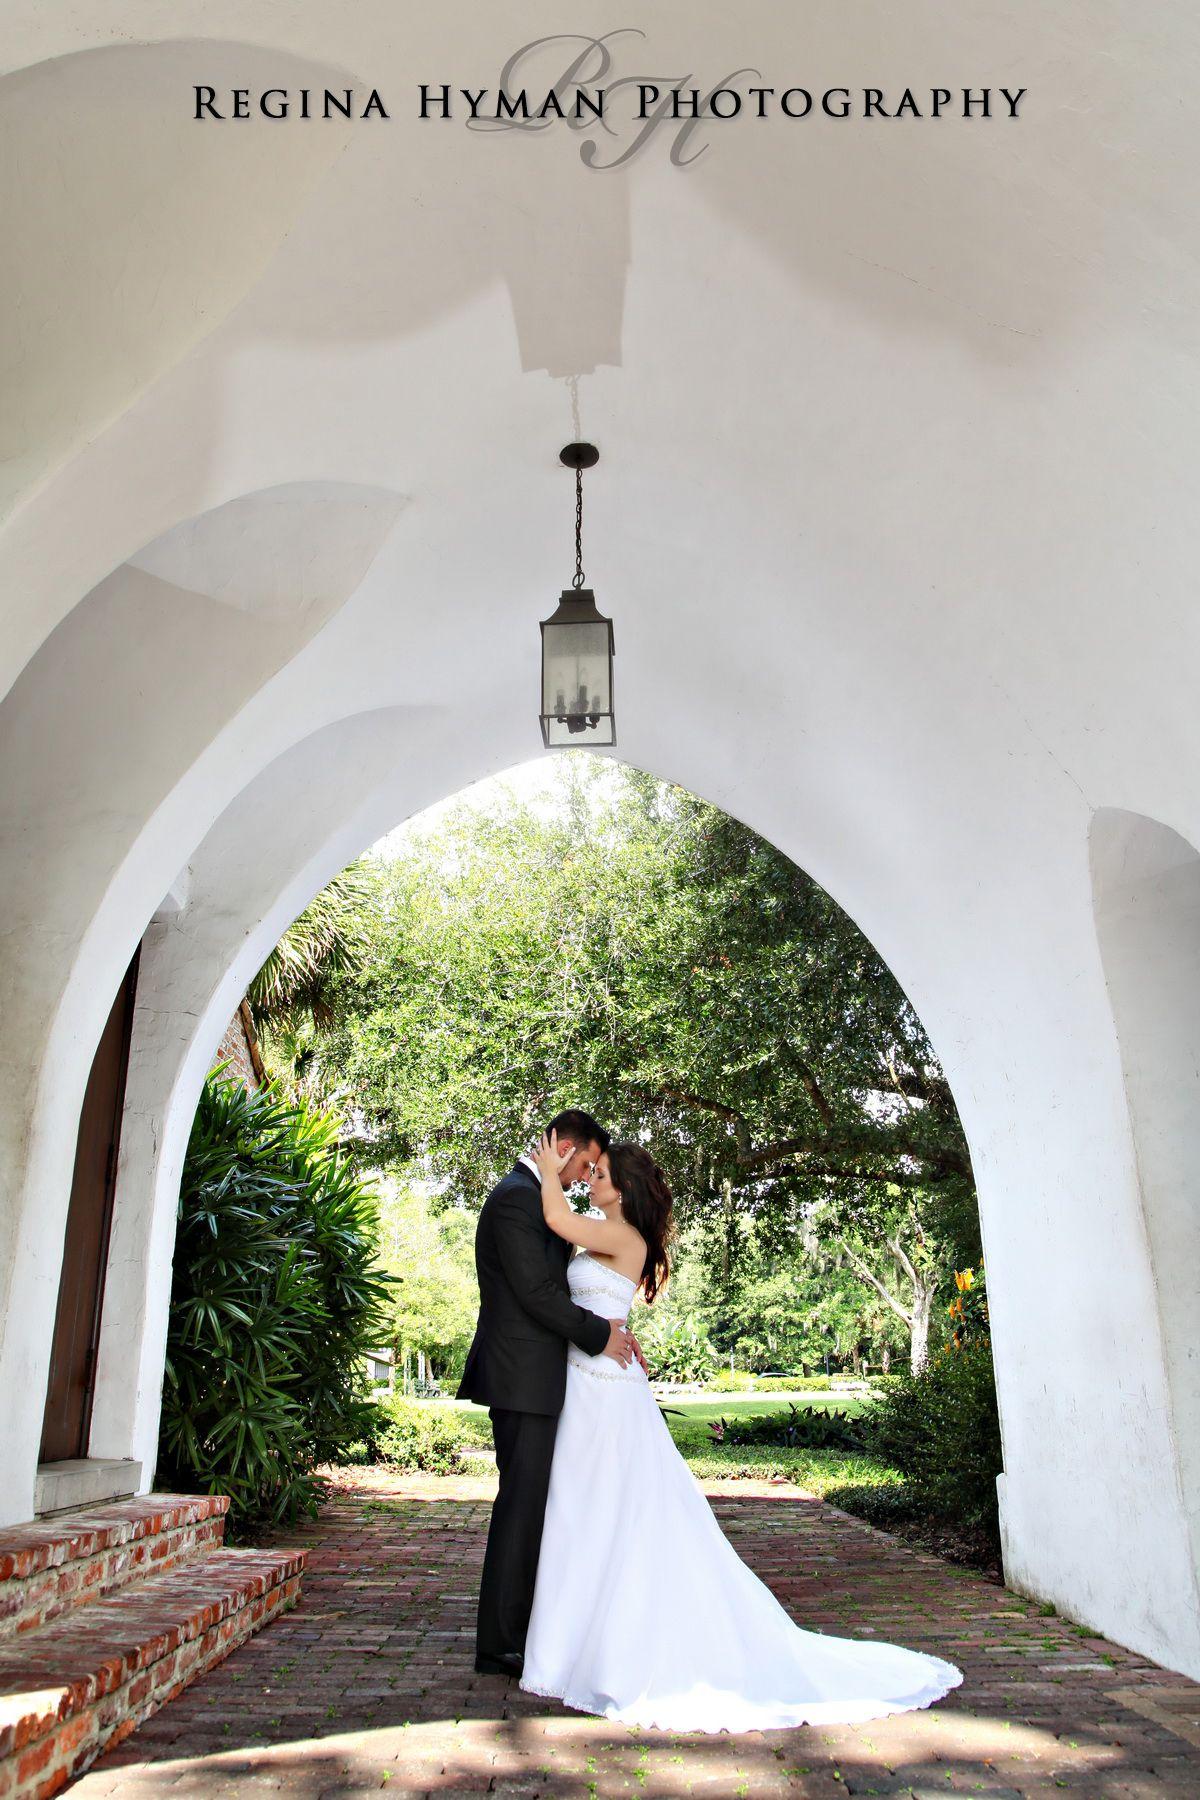 Bridal Portrait At Casa Feliz Winter Park Orlando Wedding Photographer Regina Hyman Photography